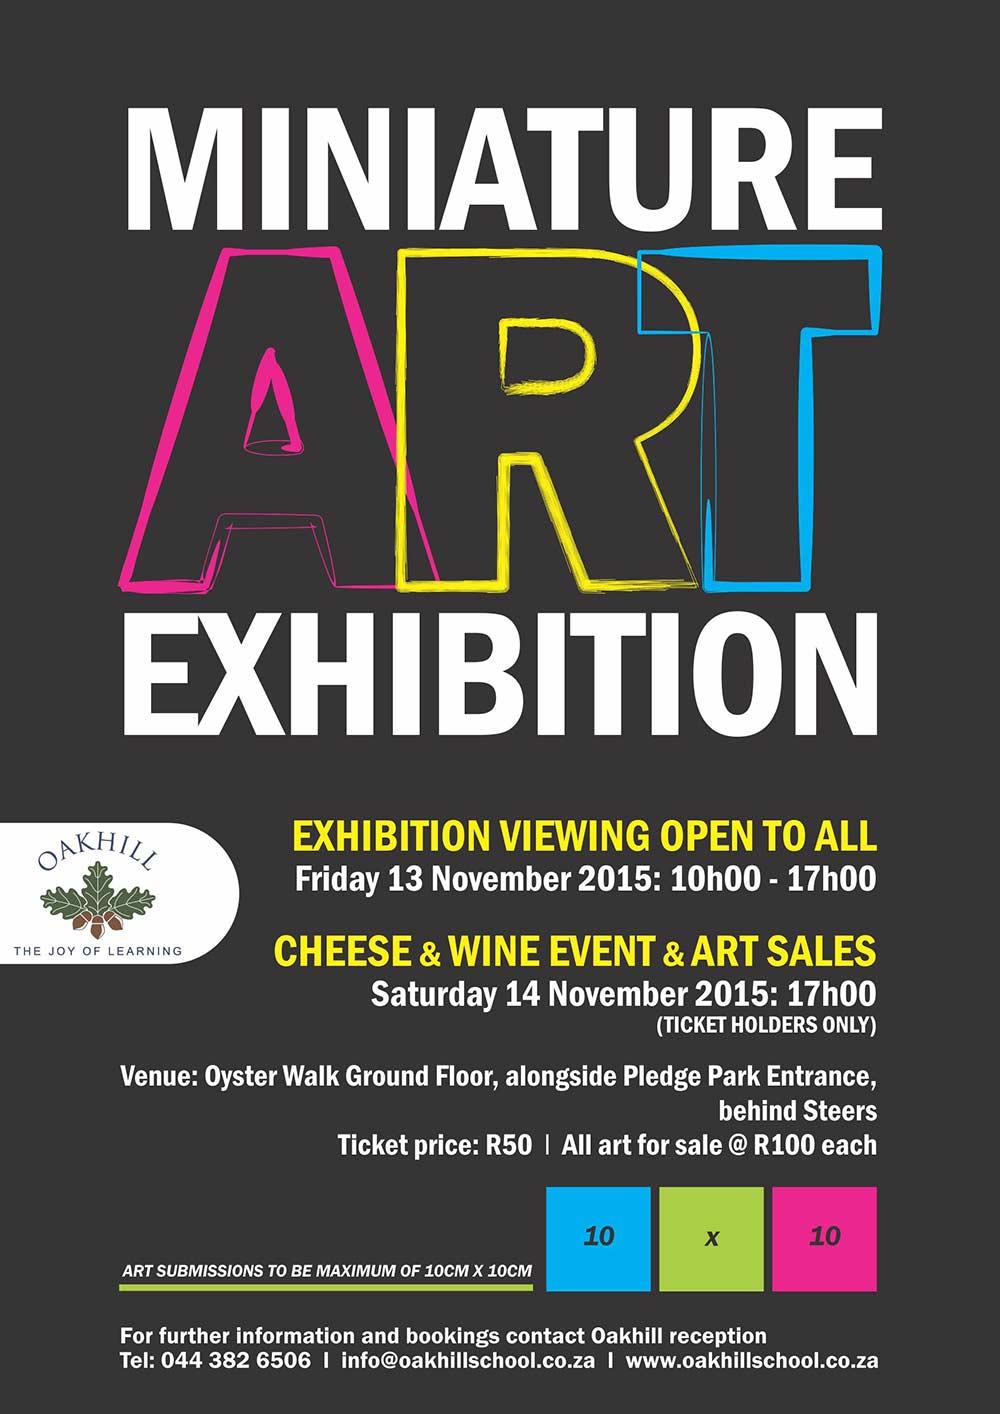 Exhibition Stand Poster Design : Miniature art exhibition